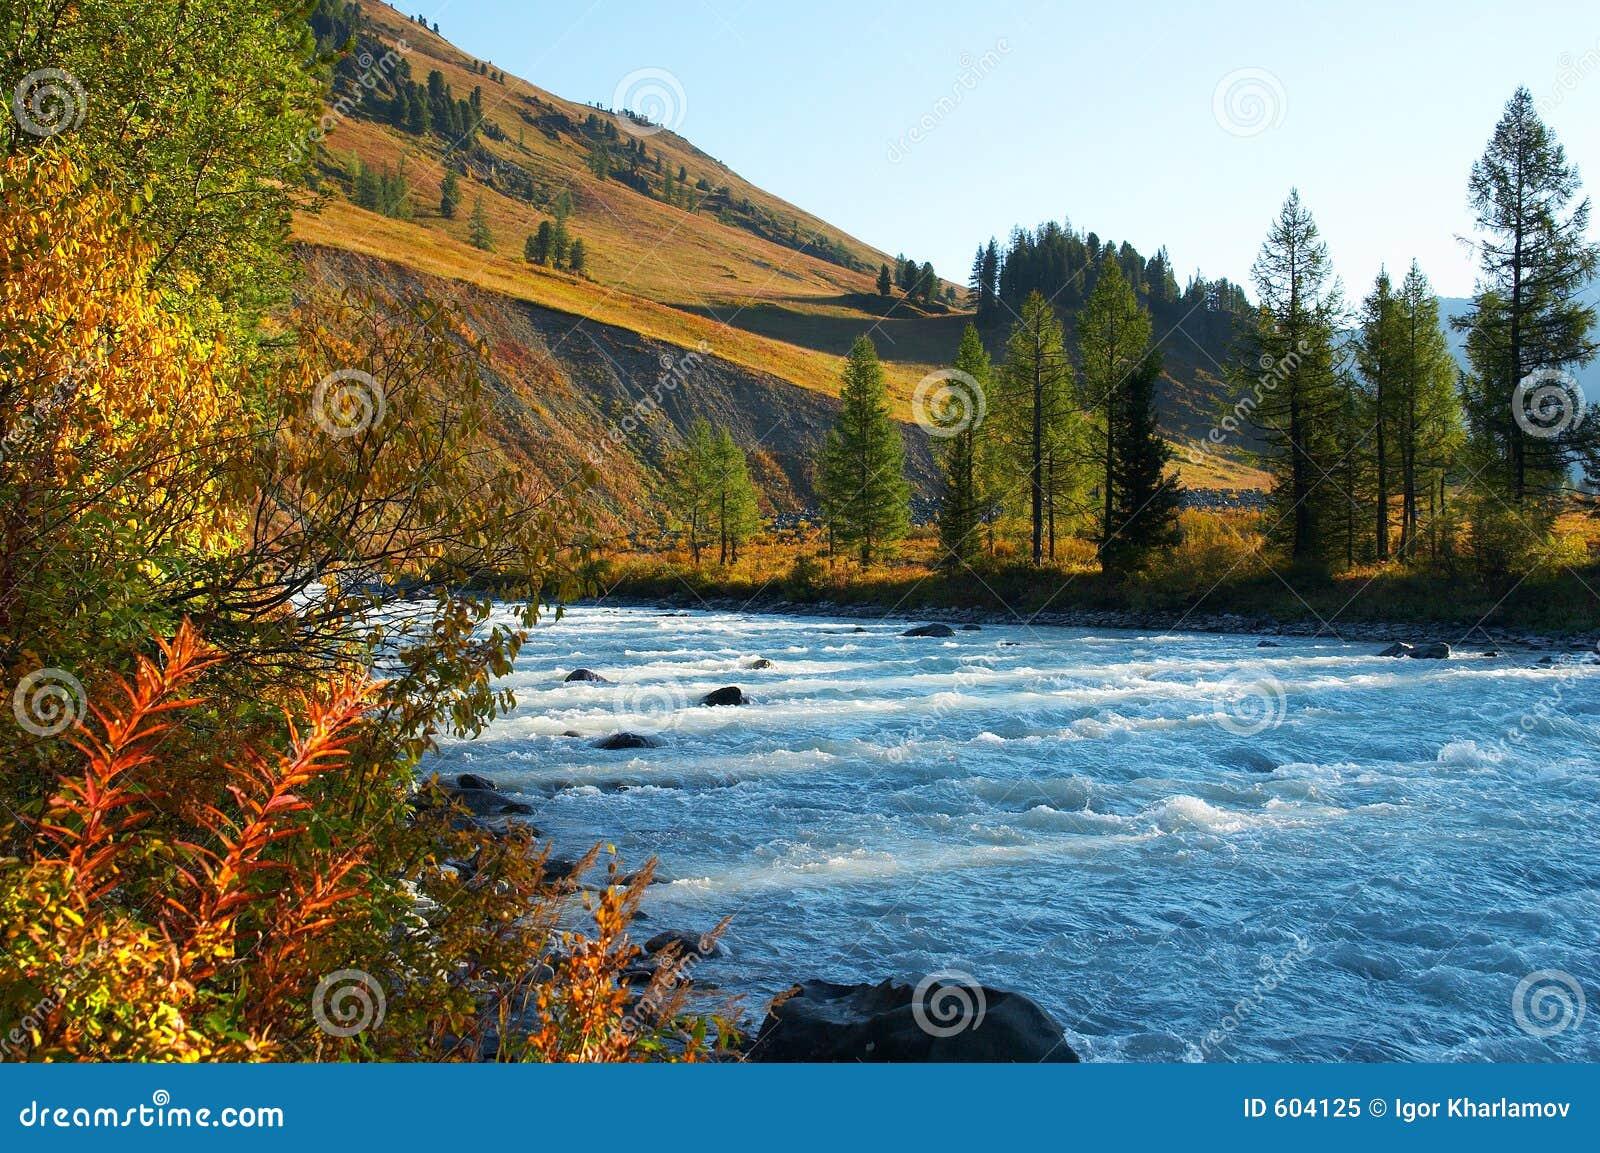 Blauw water in rivier.